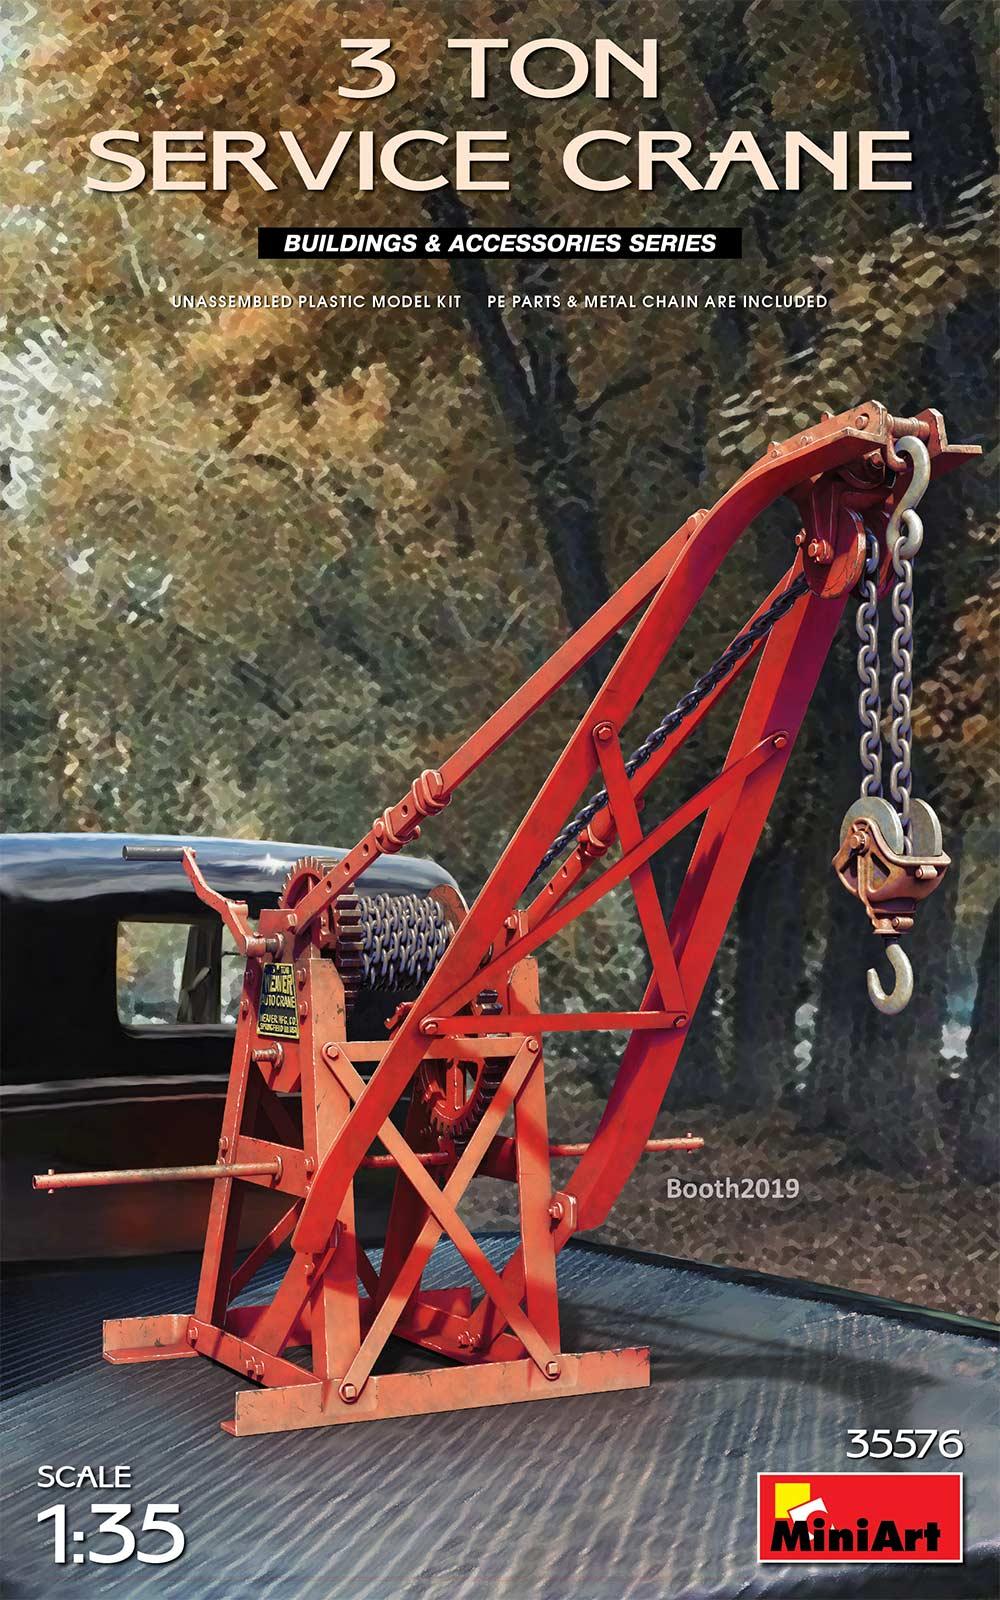 MiniArt 3 Tonne Service Crane (1/35)